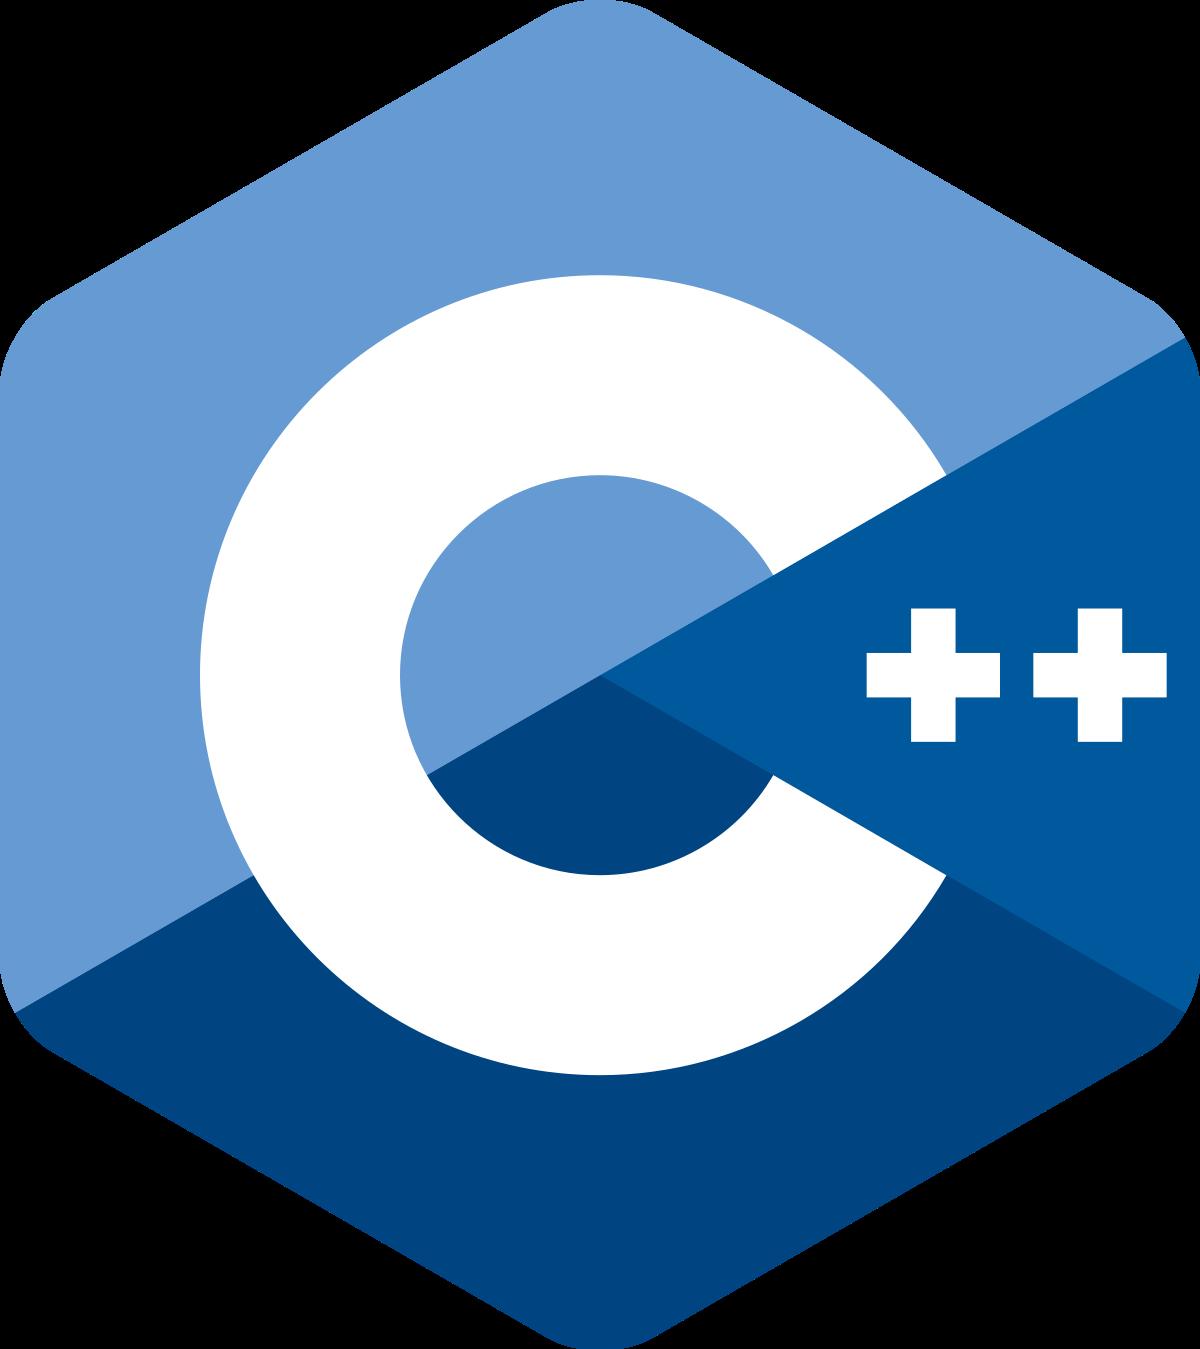 C++ for School